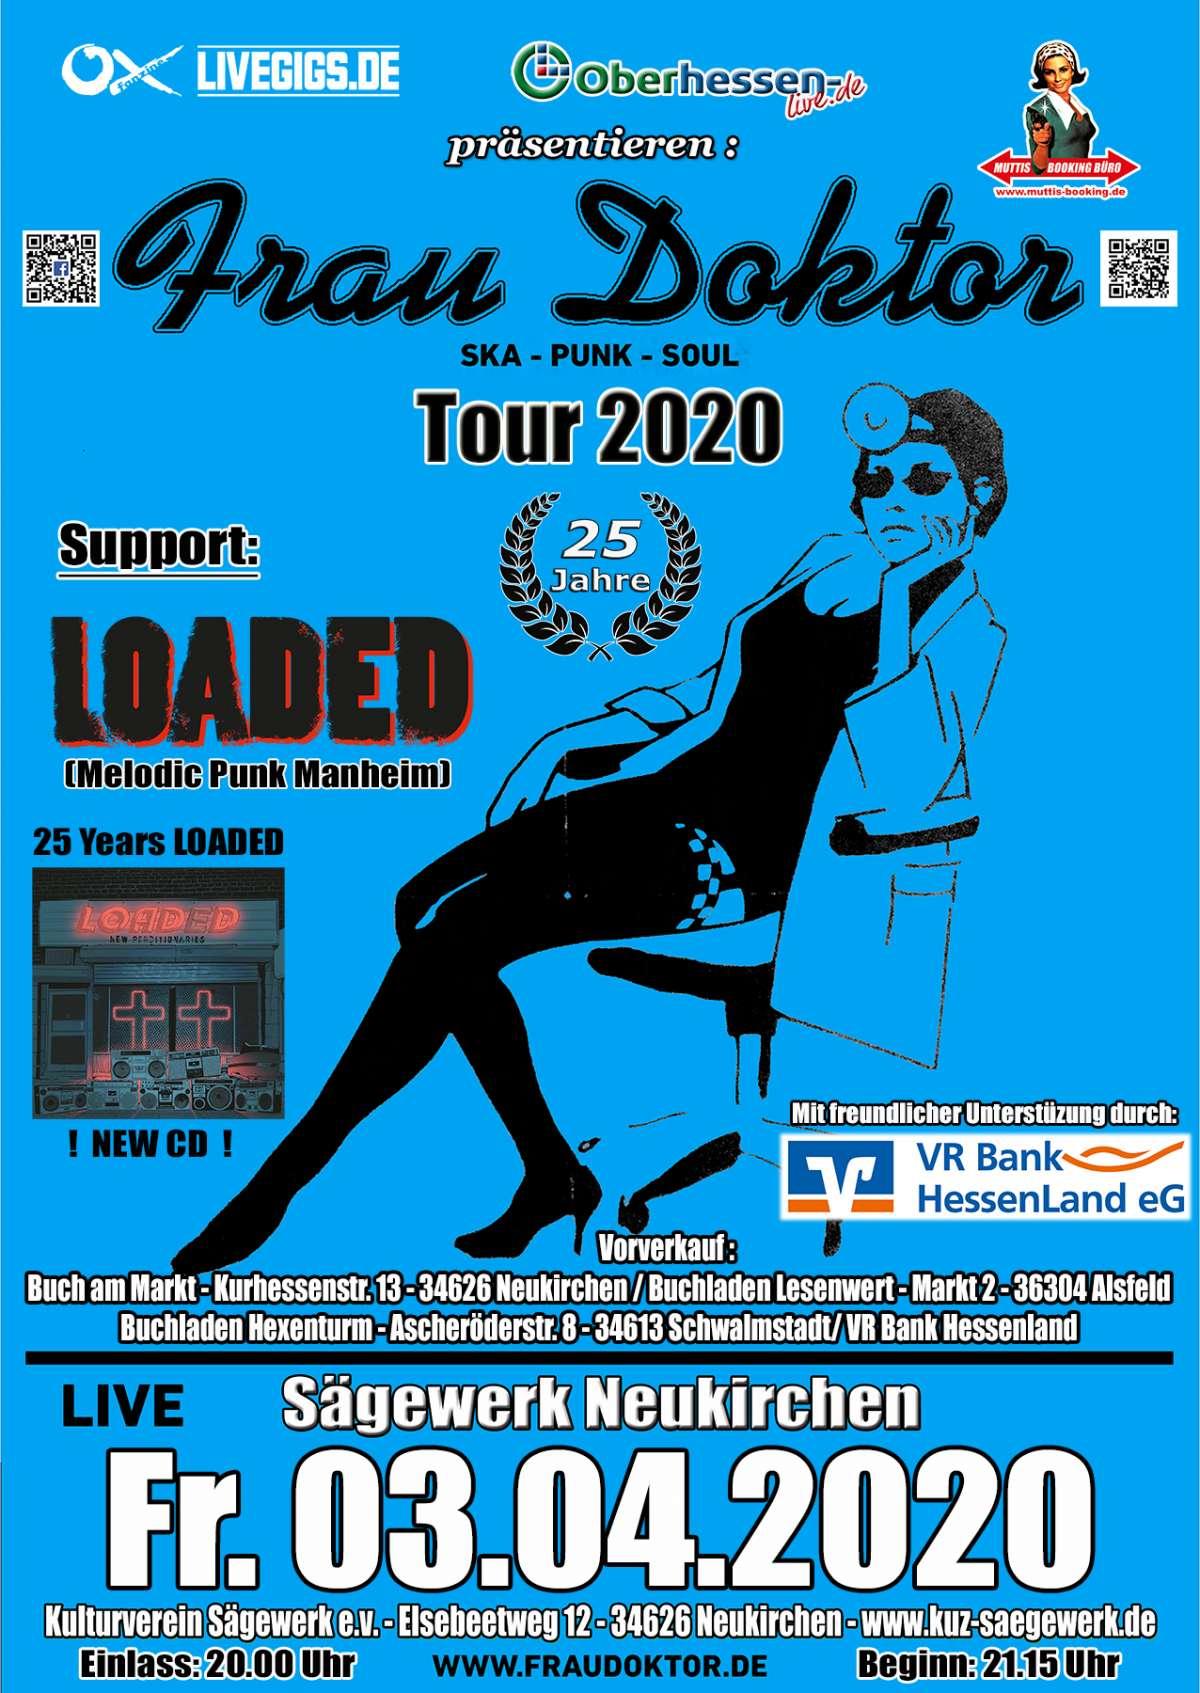 ABGESAGT! 25 Jahre Frau Doktor Ska Punk Soul - Frau Doktor, Loaded - Sägewerk Neukirchen - Neukirchen (Knuell)